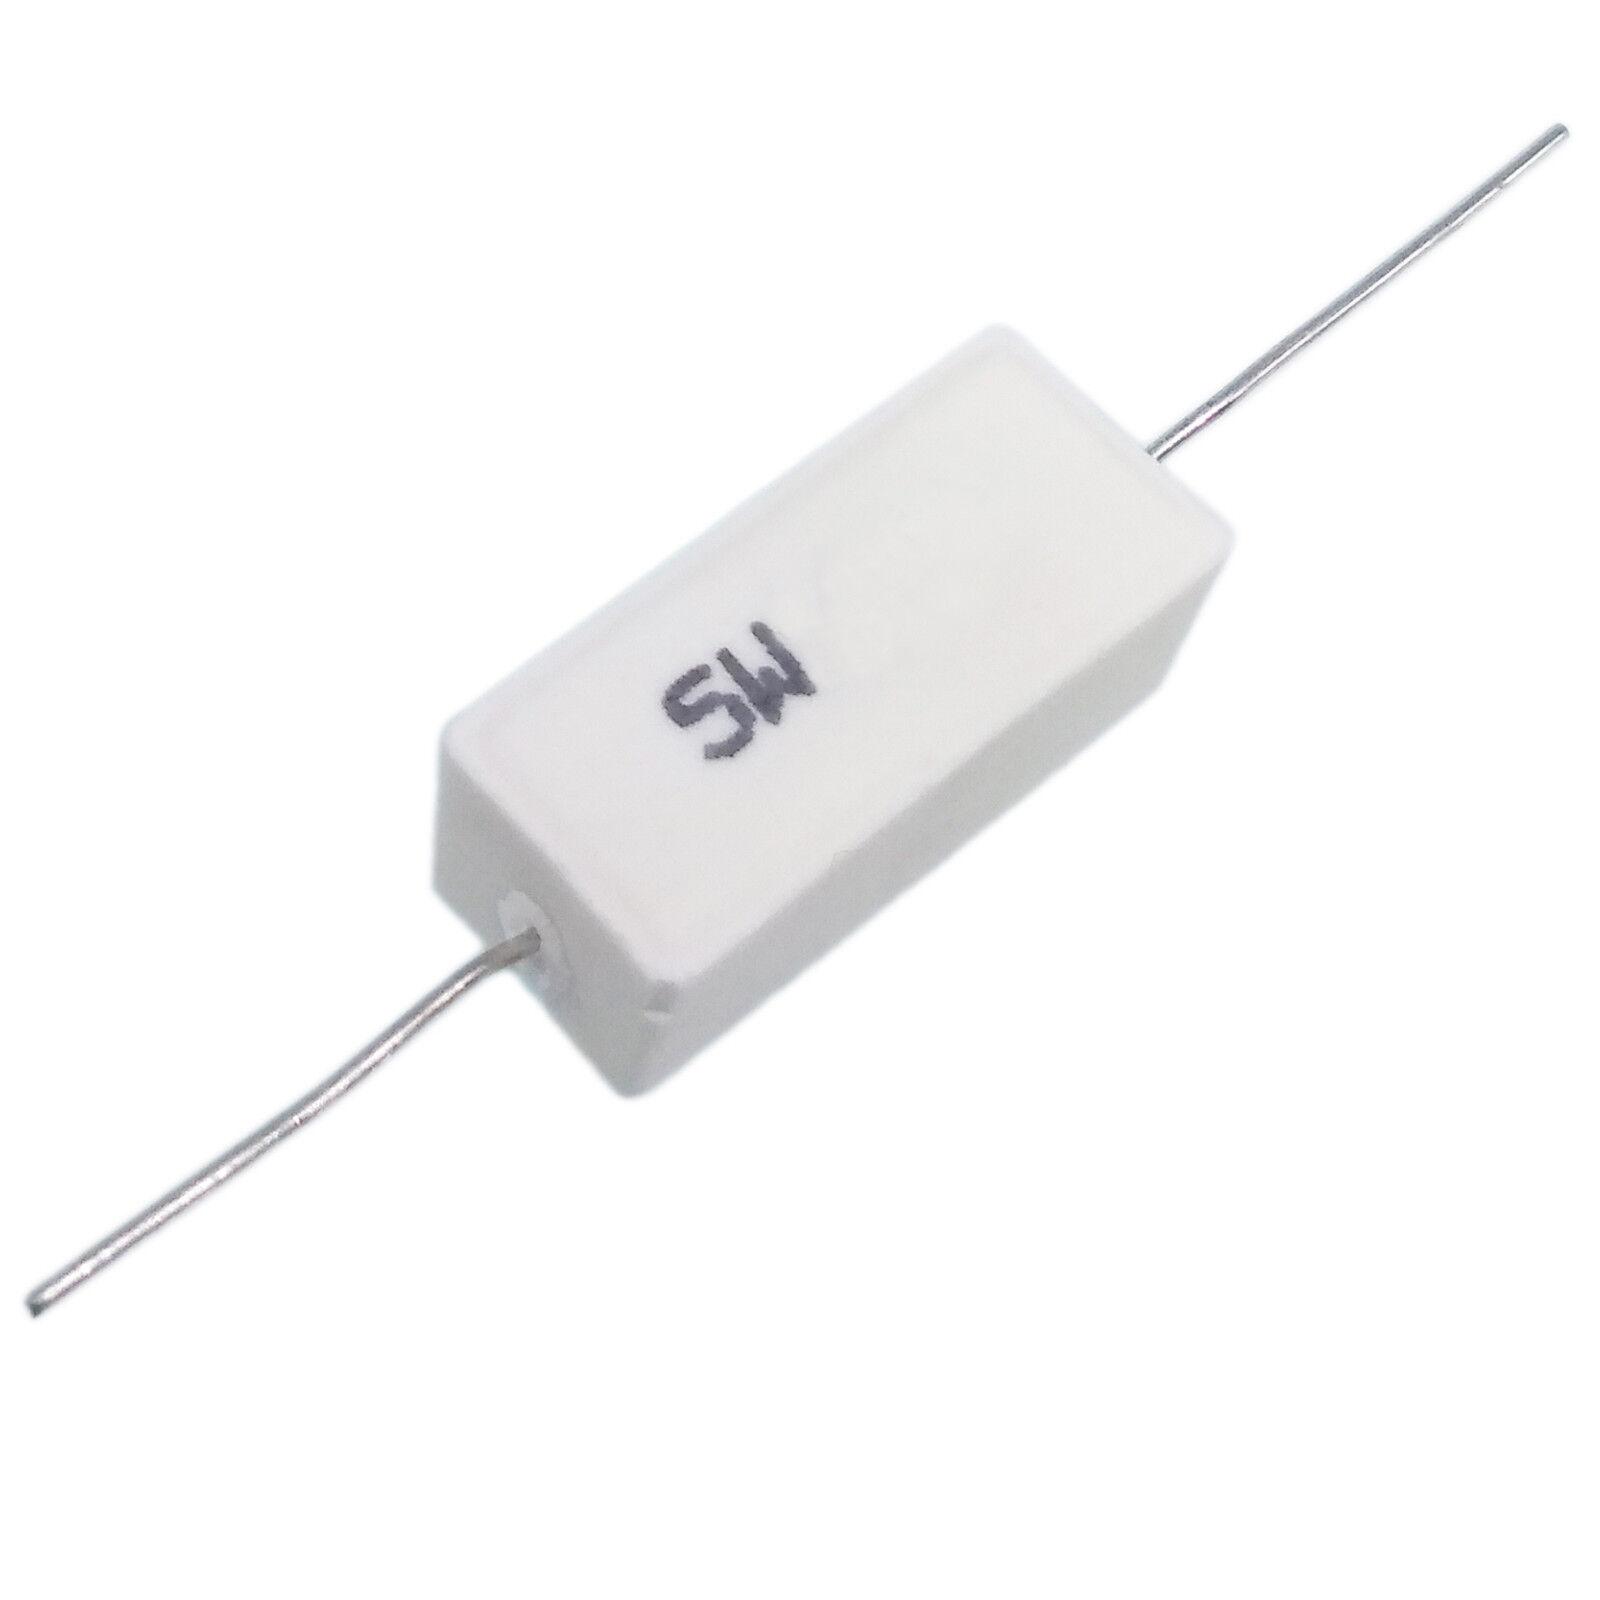 US Stock 10pcs 5.1 ohm 5R1ΩJ 5 watt Axial Ceramic Cement Power Resistor 5W